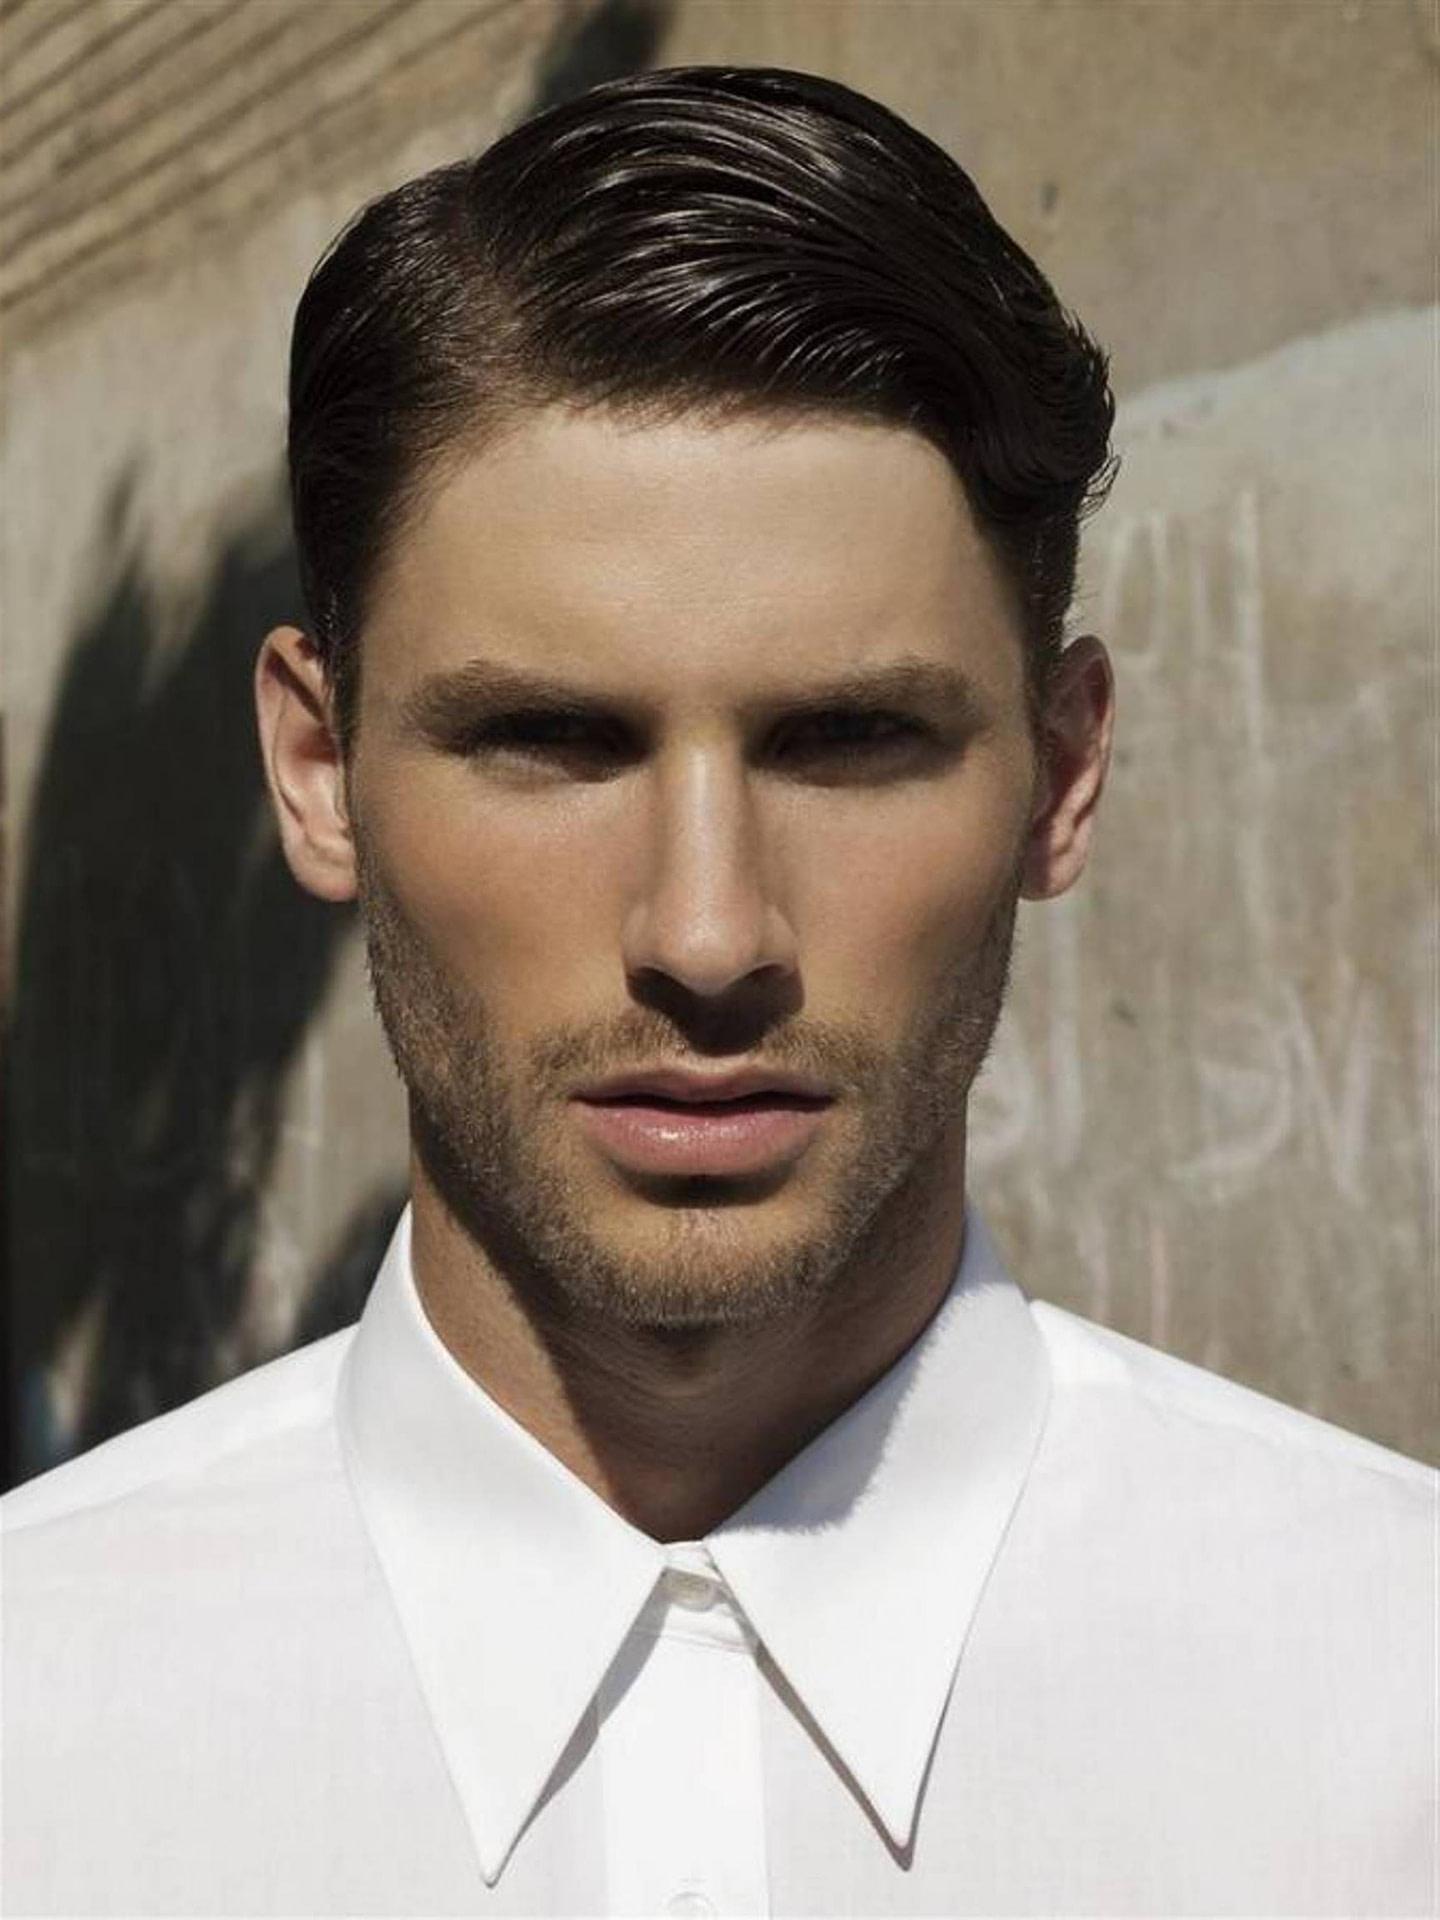 neu Best Of Frisur für Männer  Haarschnitt männer, Frisuren, Coole  - männer frisuren 2019 locken